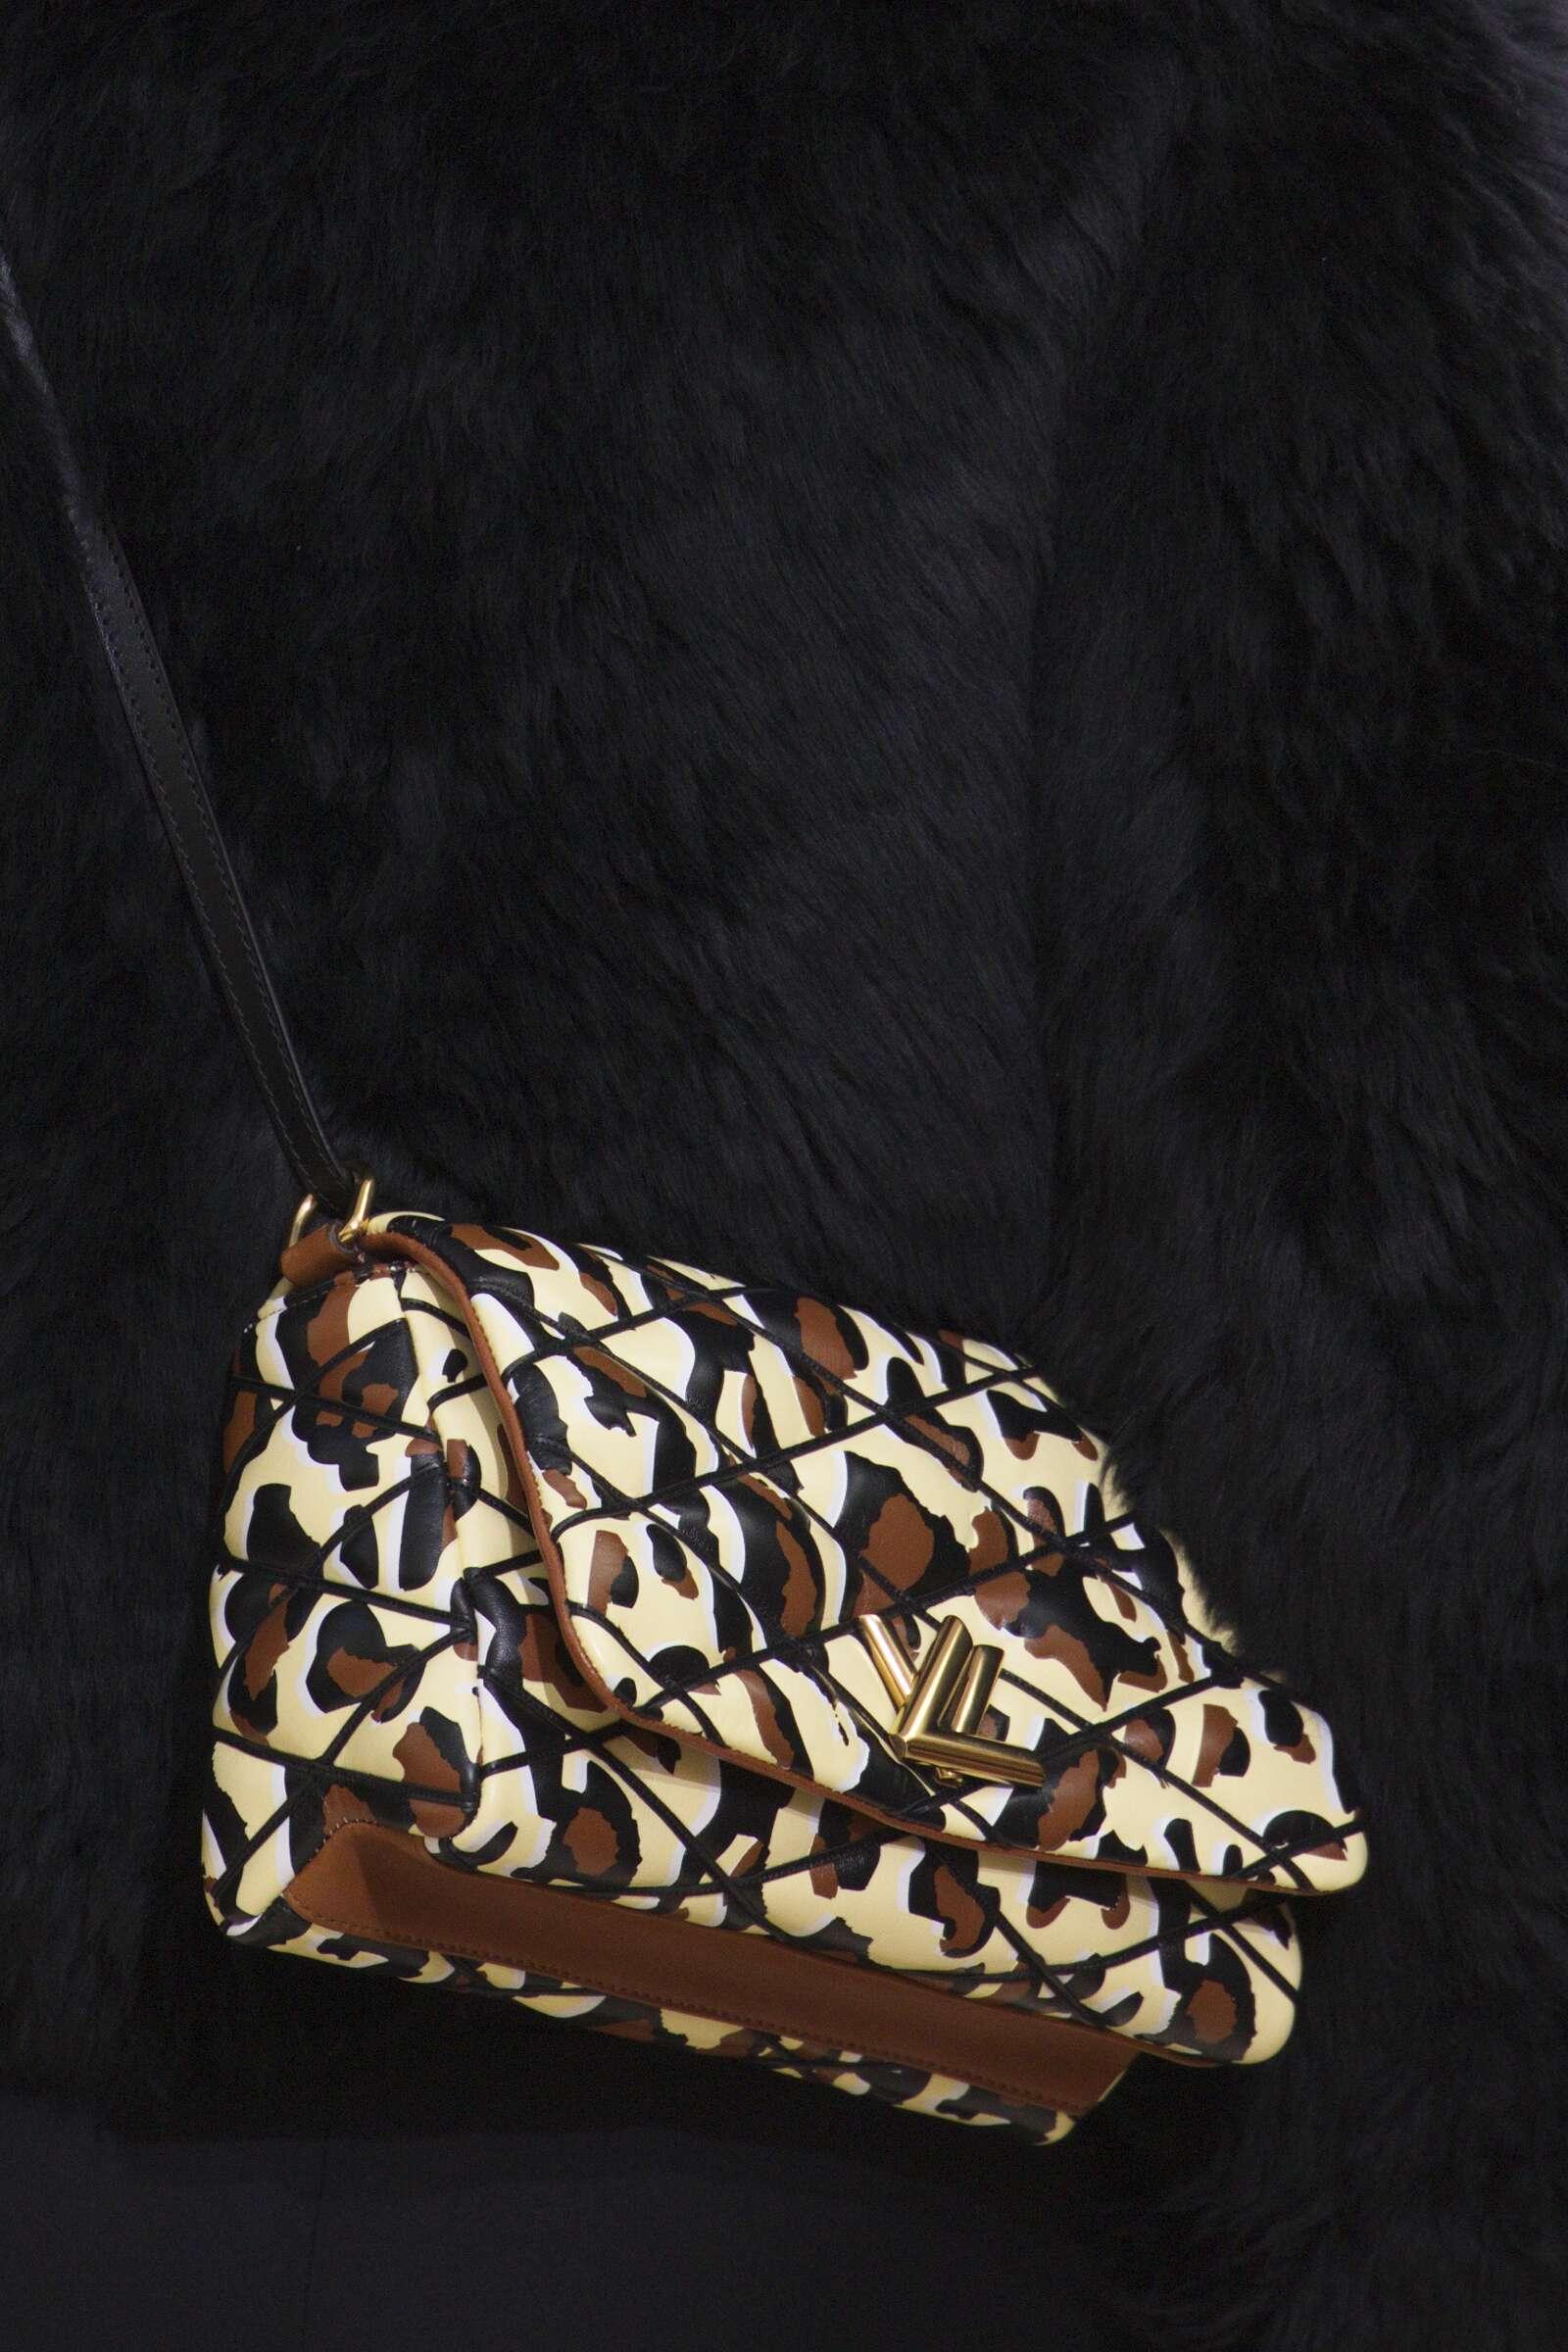 Fall 2015 Women Fashion Show Louis Vuitton Bag Details Collection